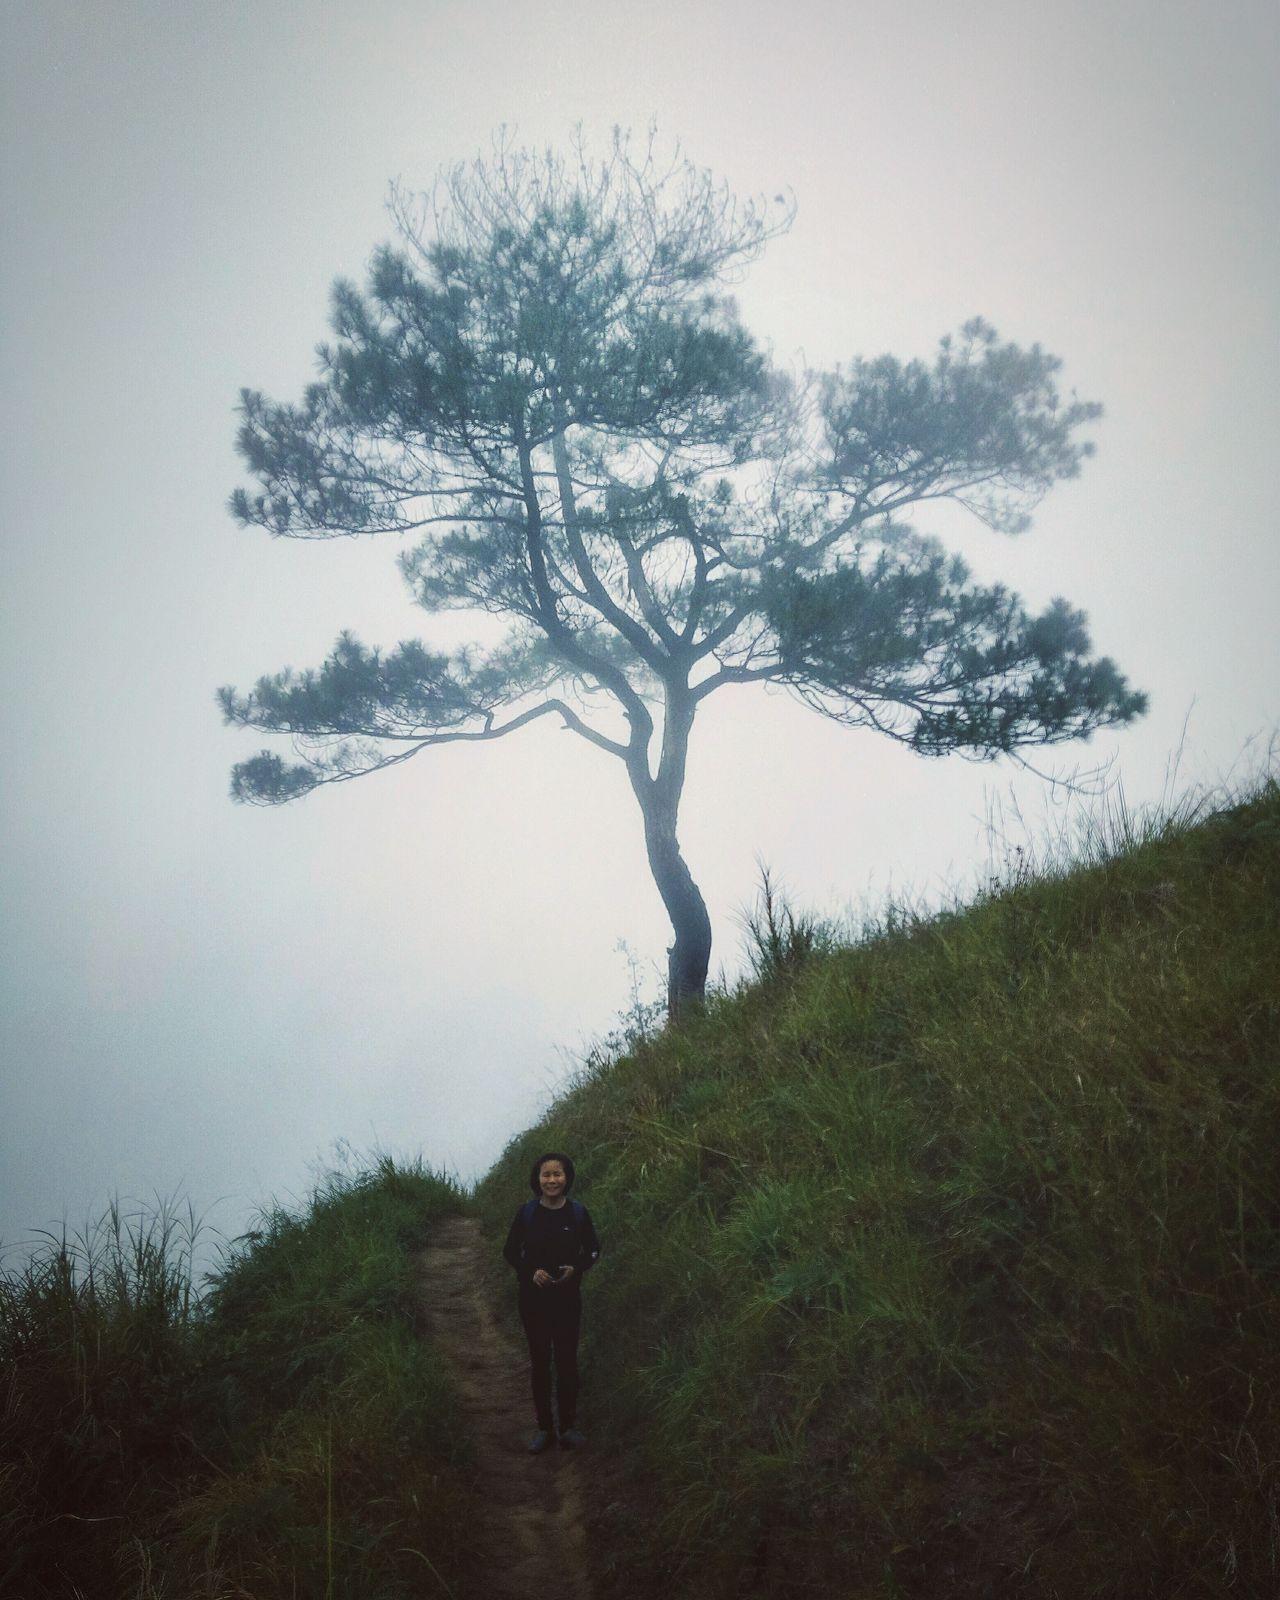 Tree Nature Fog Philippines Benguet Itogon Baguio Mount Ulap Commune First Eyeem Photo